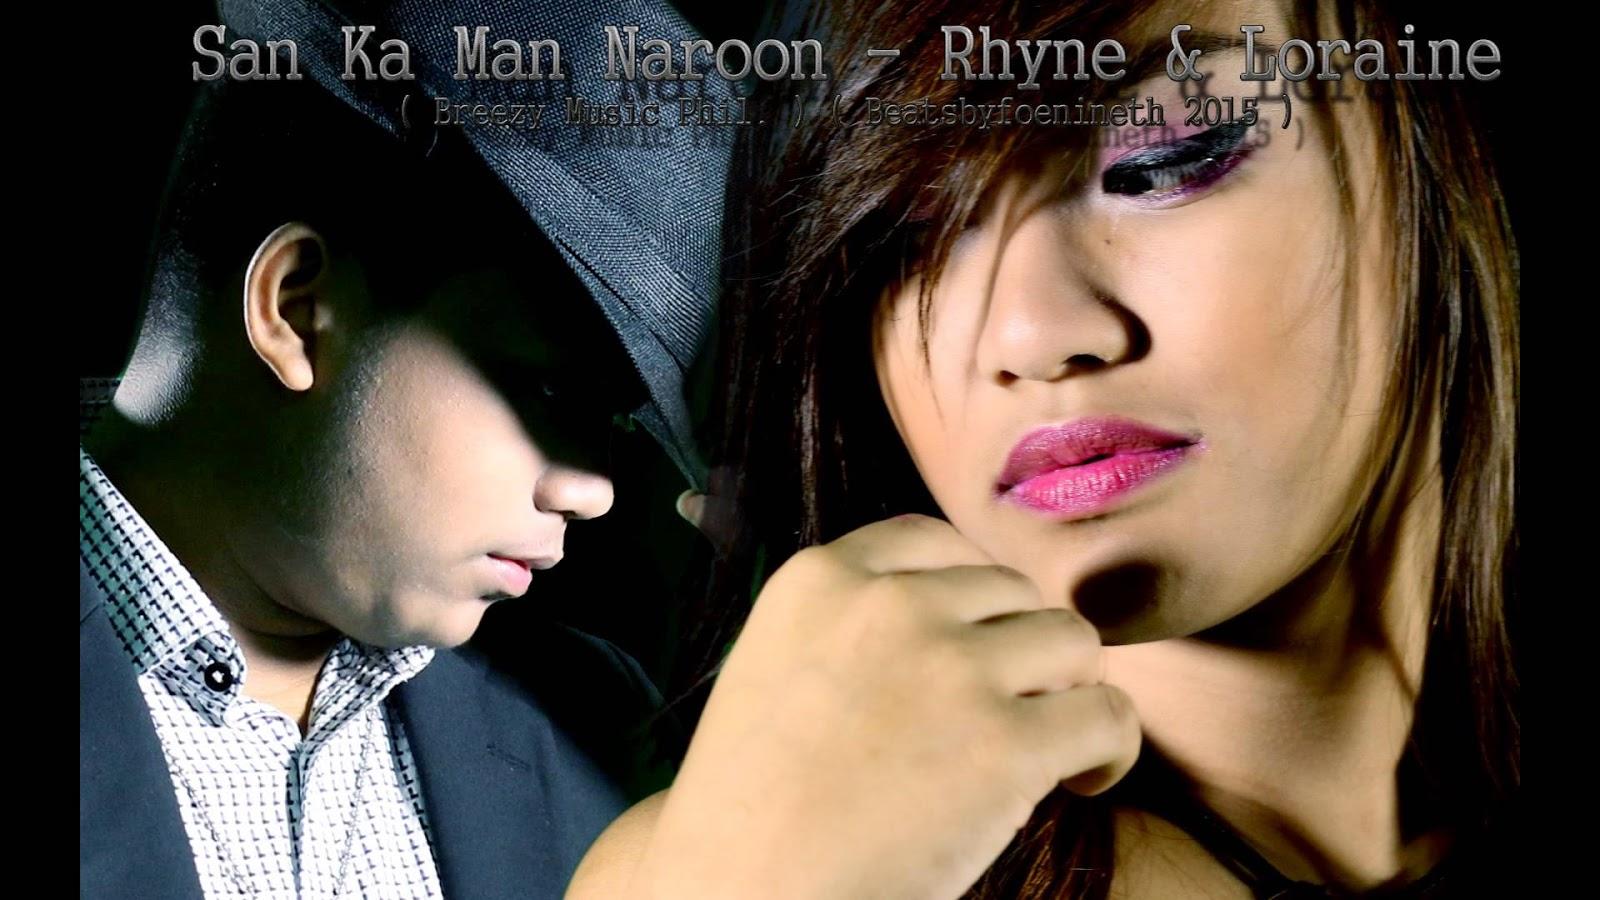 San Ka Man Naroon by Rhyne & Loraine (Jam Sebastian of Jamich Tribute)